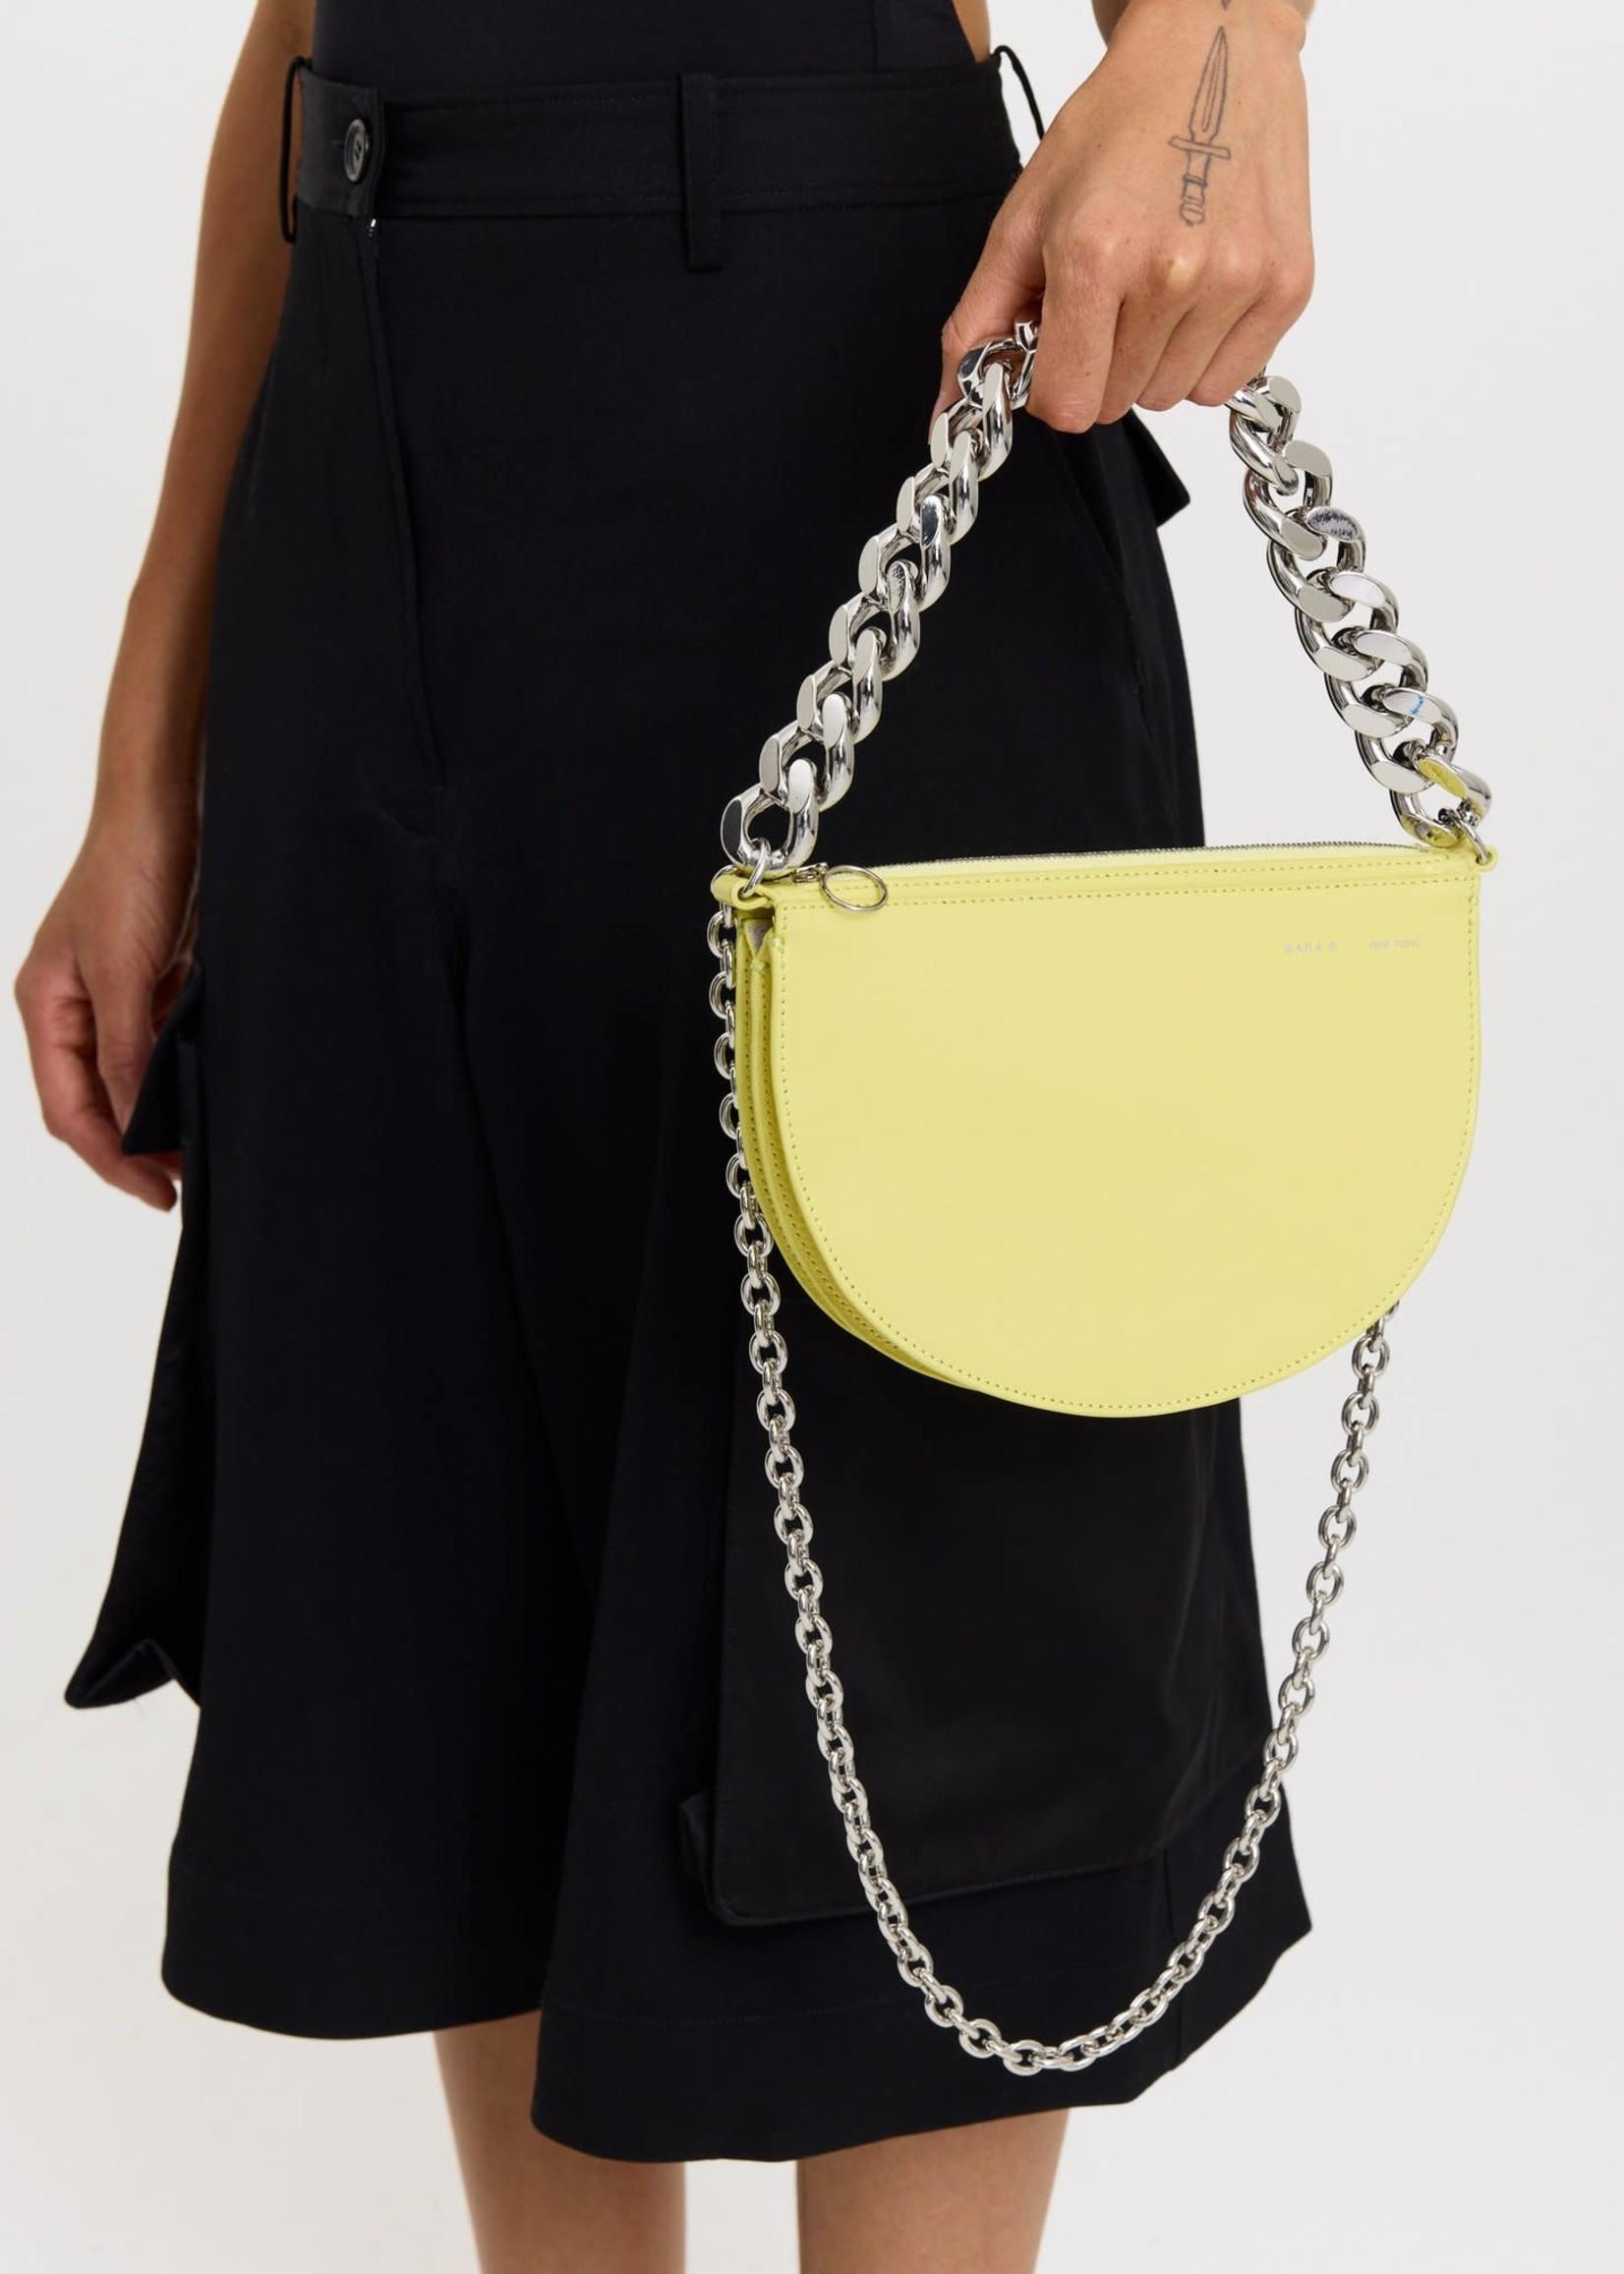 KARA Starfruit Bag in Butter